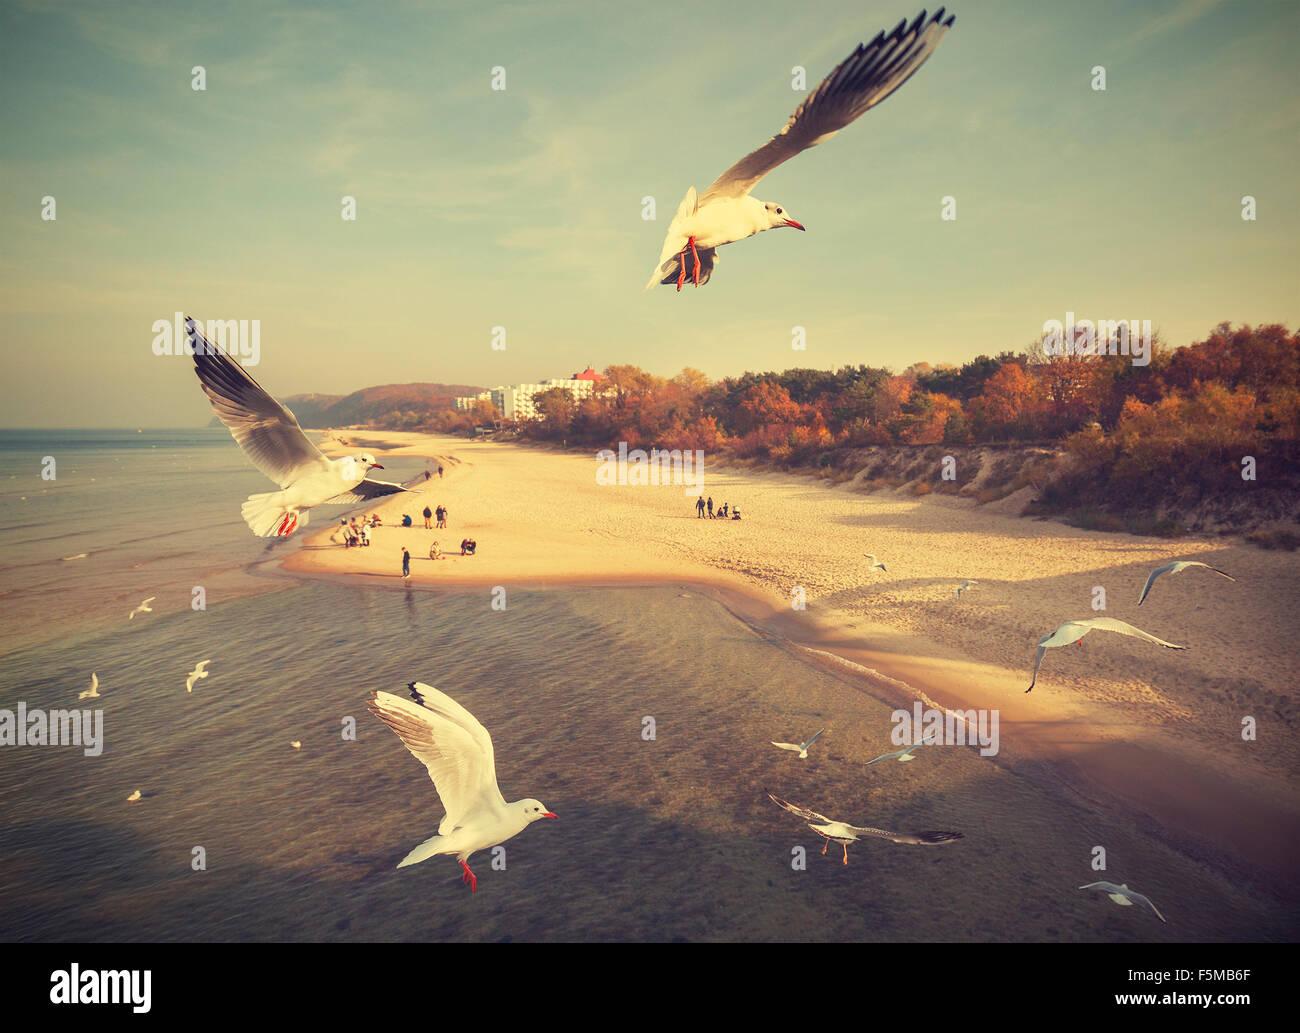 Vintage Retro stilisierte Vögel über einen Strand, Ostsee, Polen. Stockbild